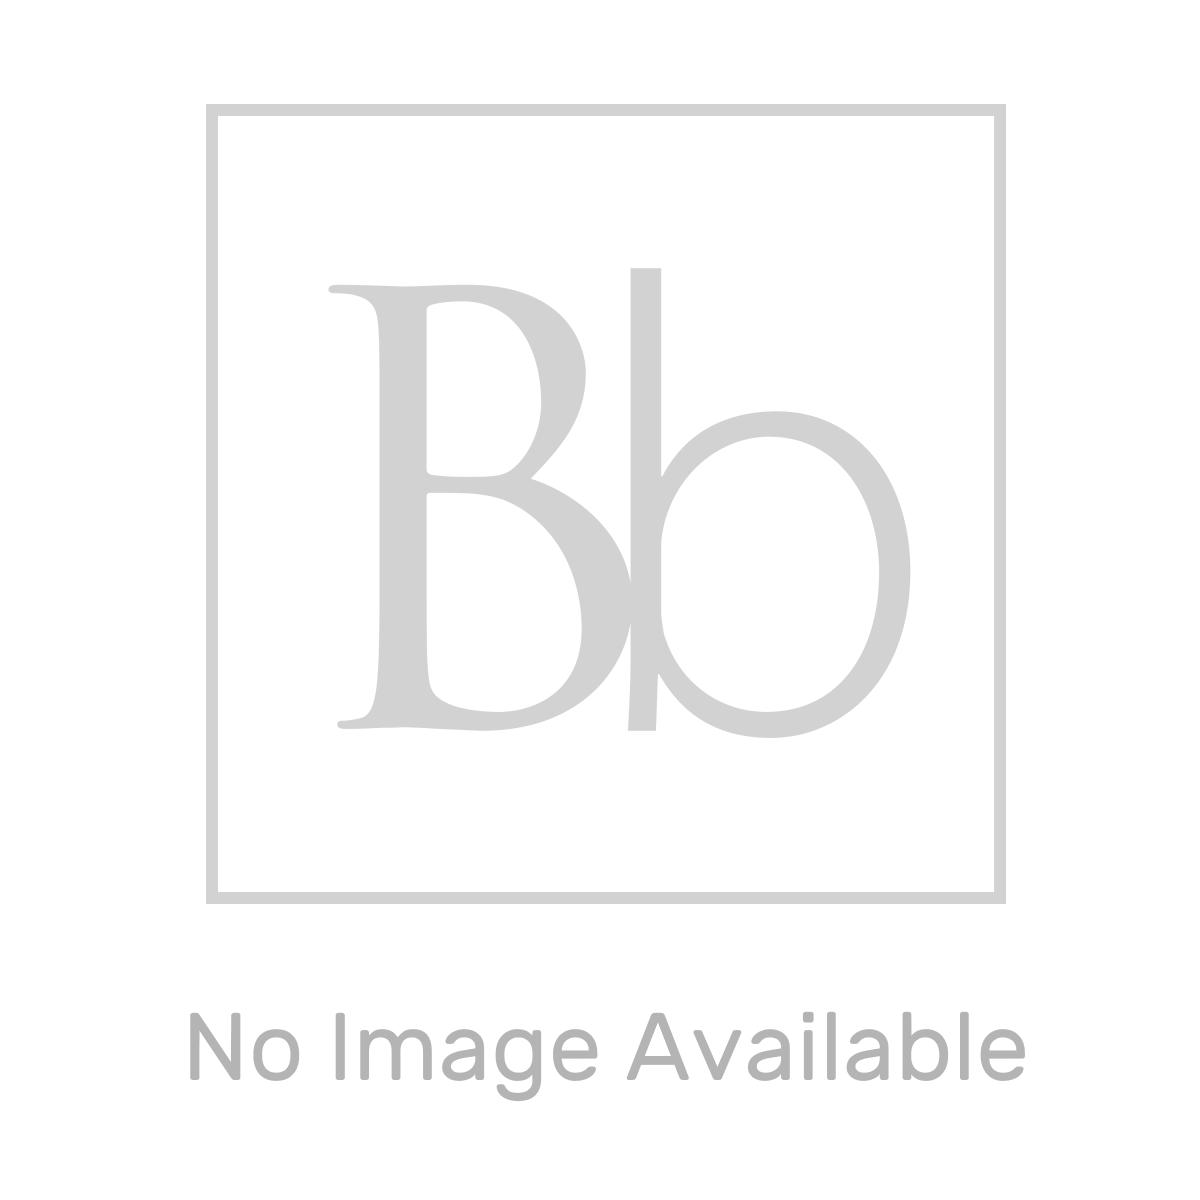 Prestige2 Frameless Single Door Quadrant Shower Enclosure Detail 4